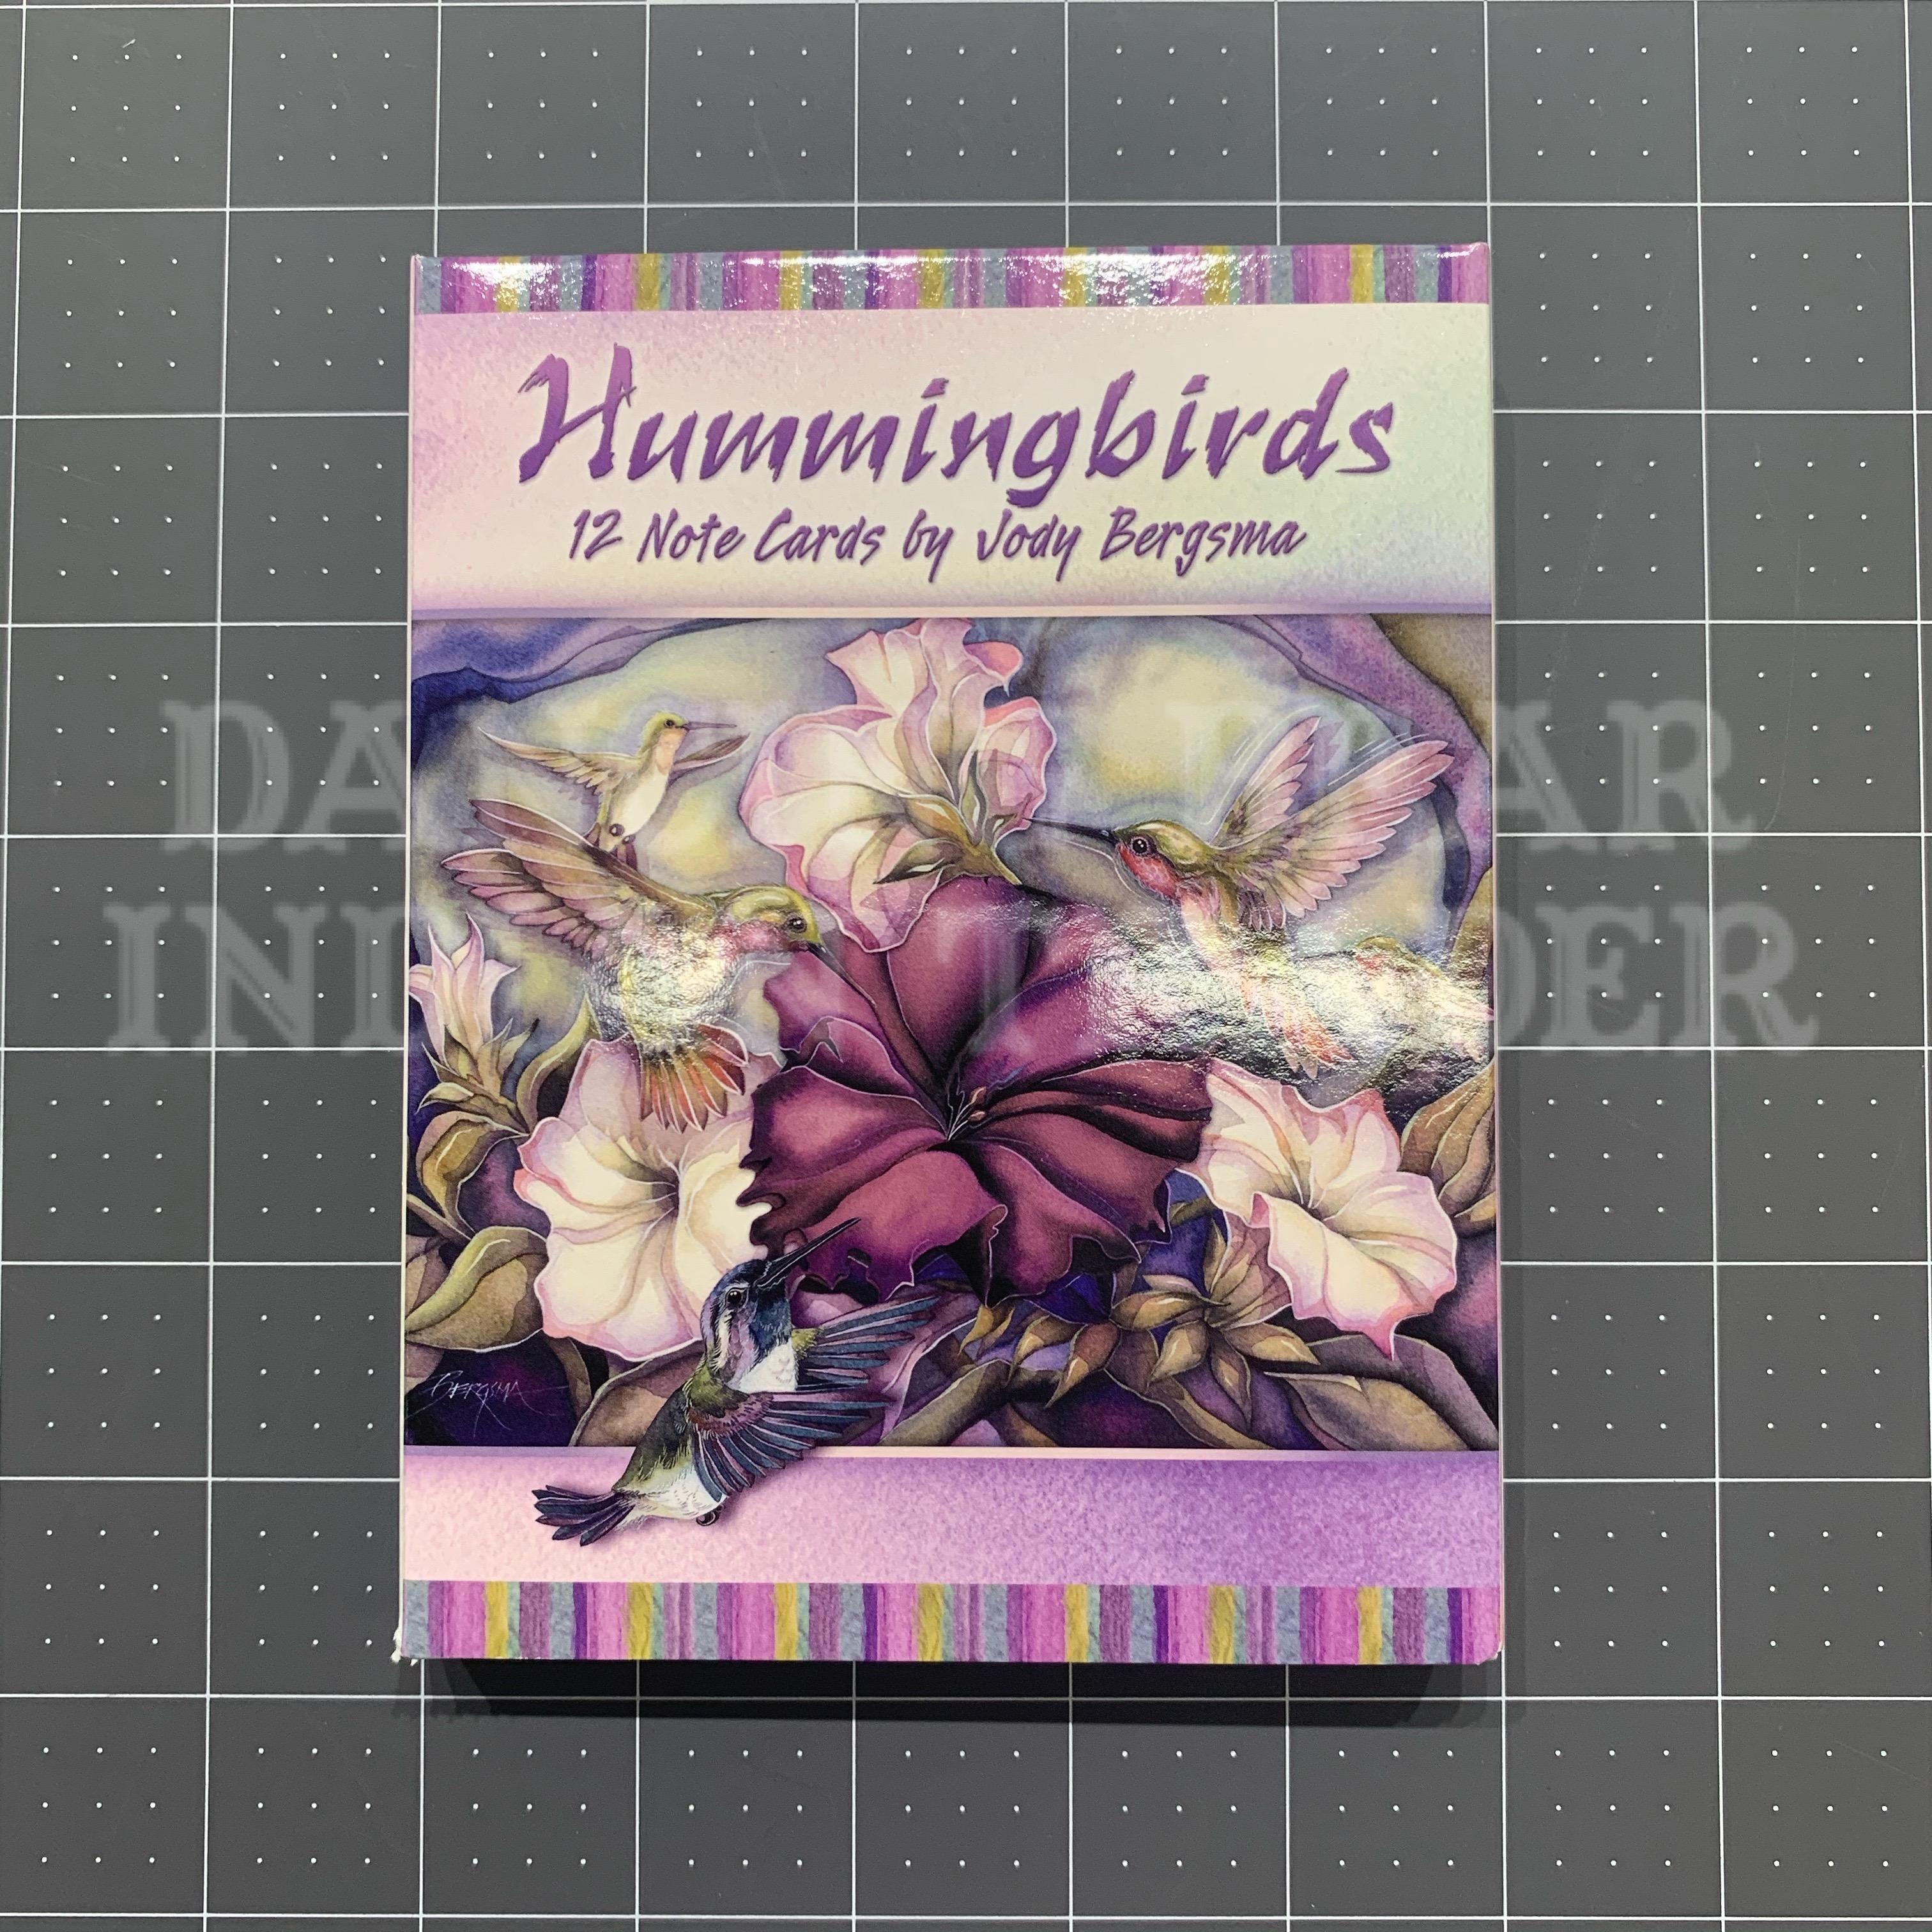 Hummingbirds Note Cards by Jody Bergsma